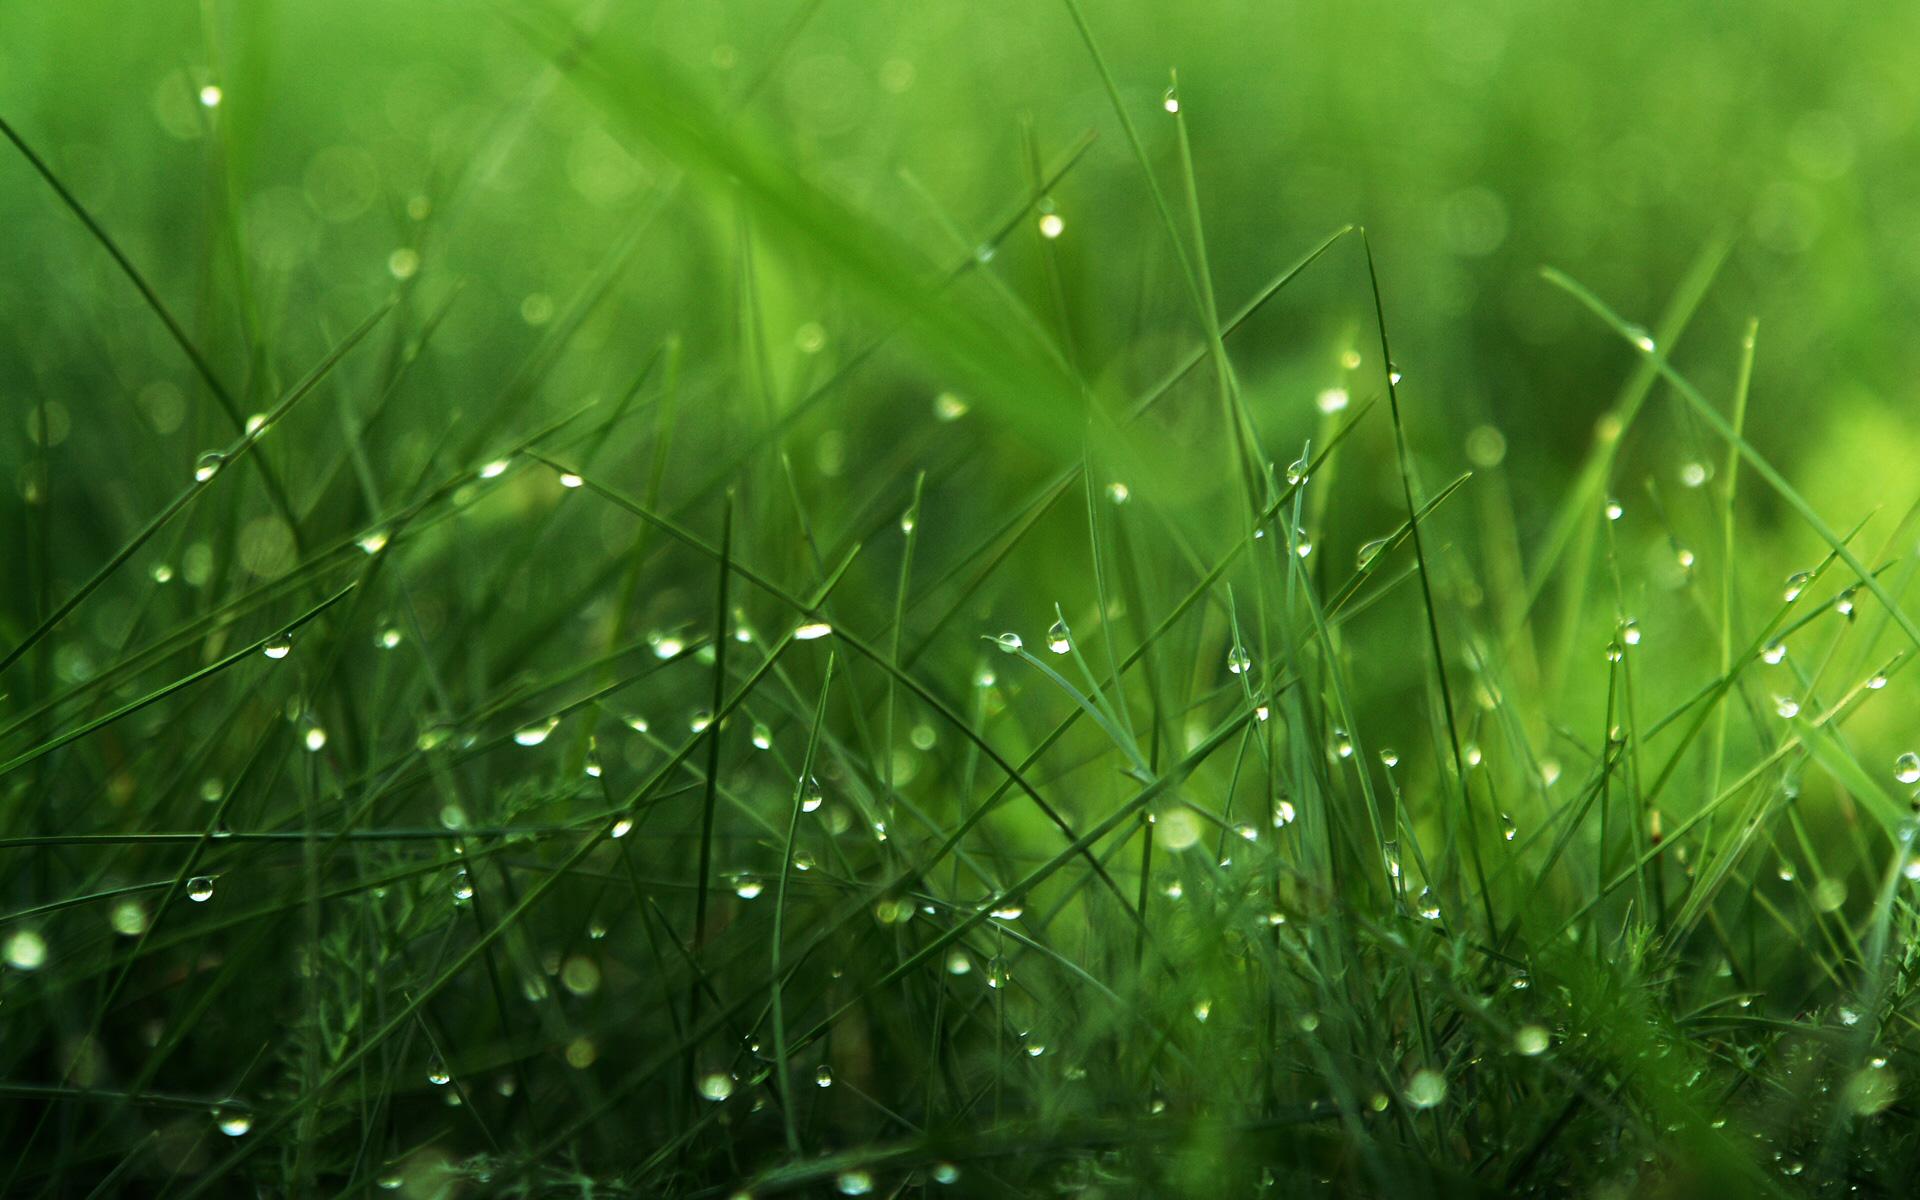 Beautiful-Grass-Nature-Wallpaper